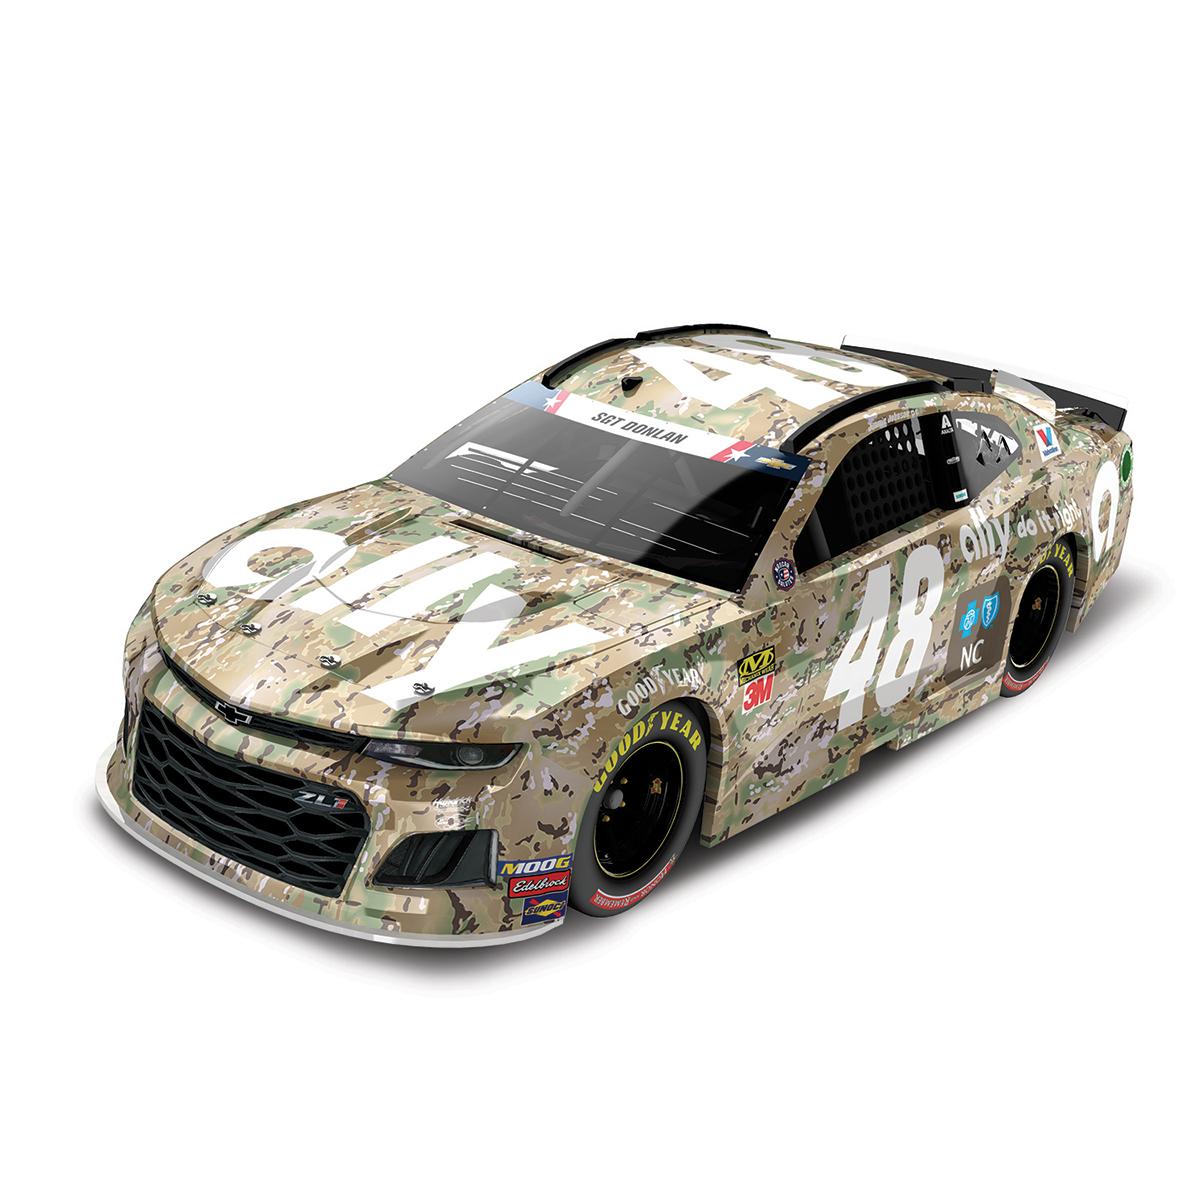 Jimmie Johnson 2019 #48 NASCAR Ally Patriotic Elite 1:24 - Die Cast